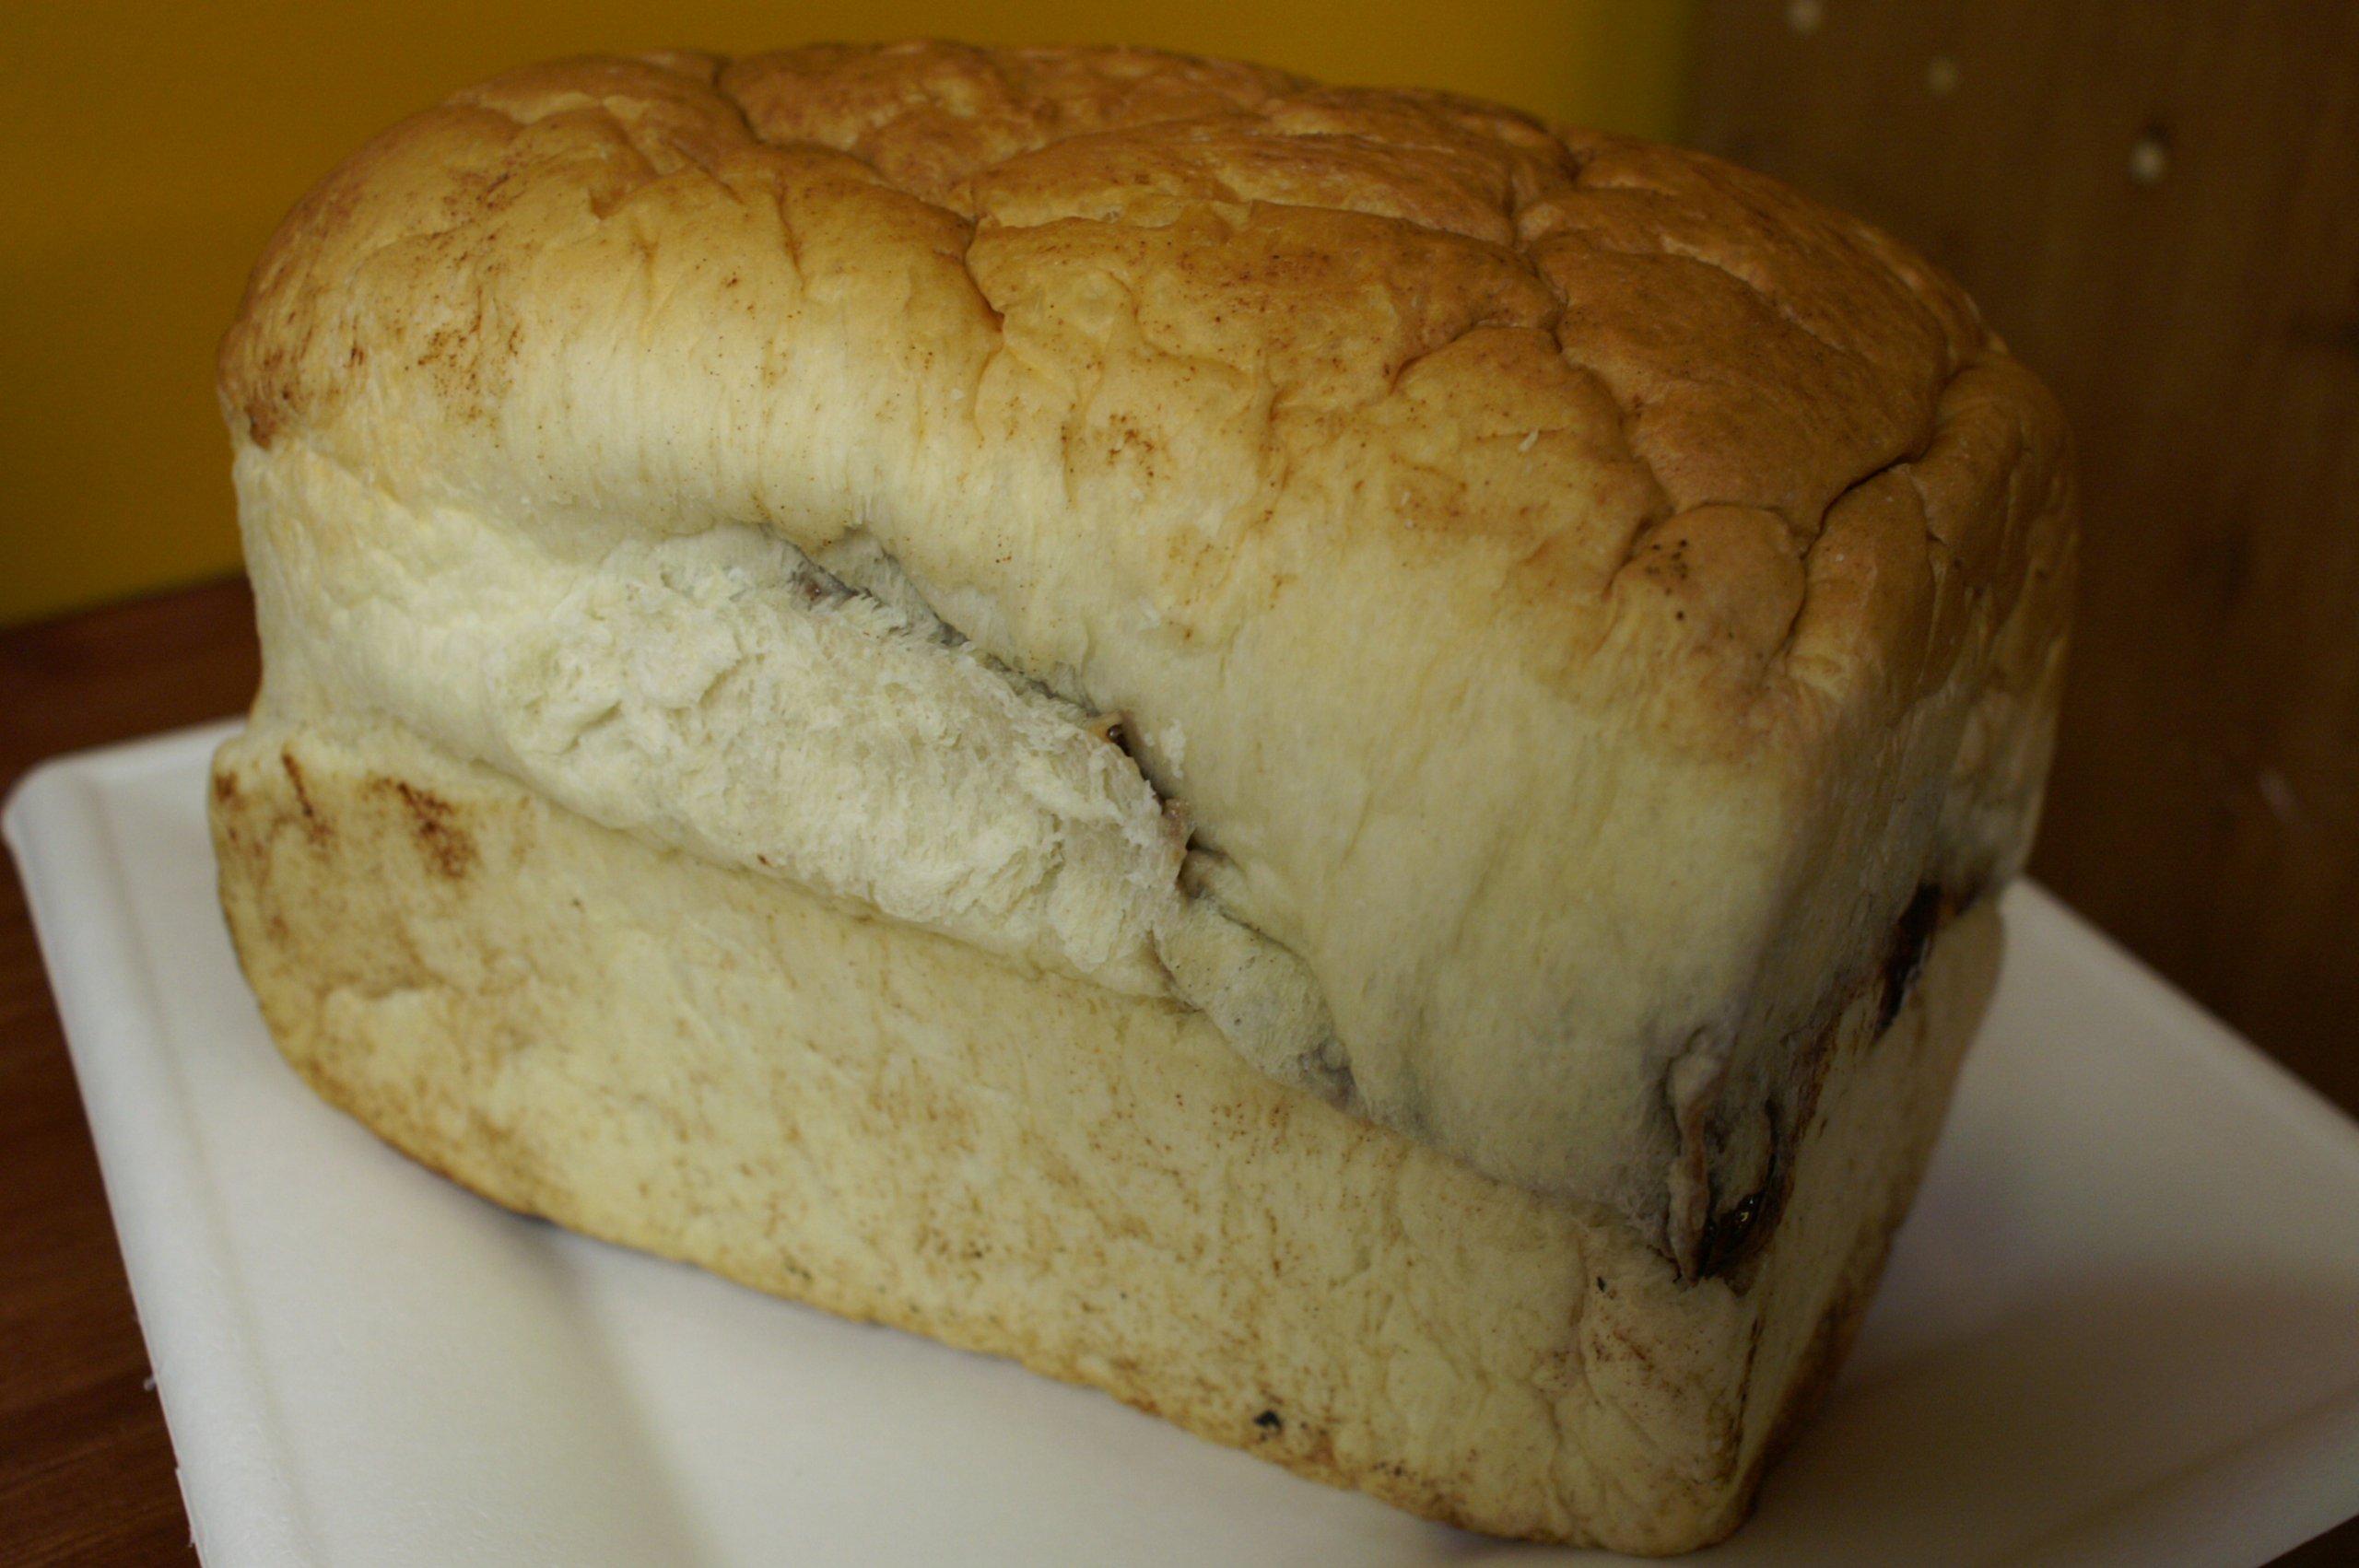 Cinnamon Swirl Bread-2 PACK- All Natural Contains Stone Ground Wheat, Water, Honey, Cinnamon, Yeast